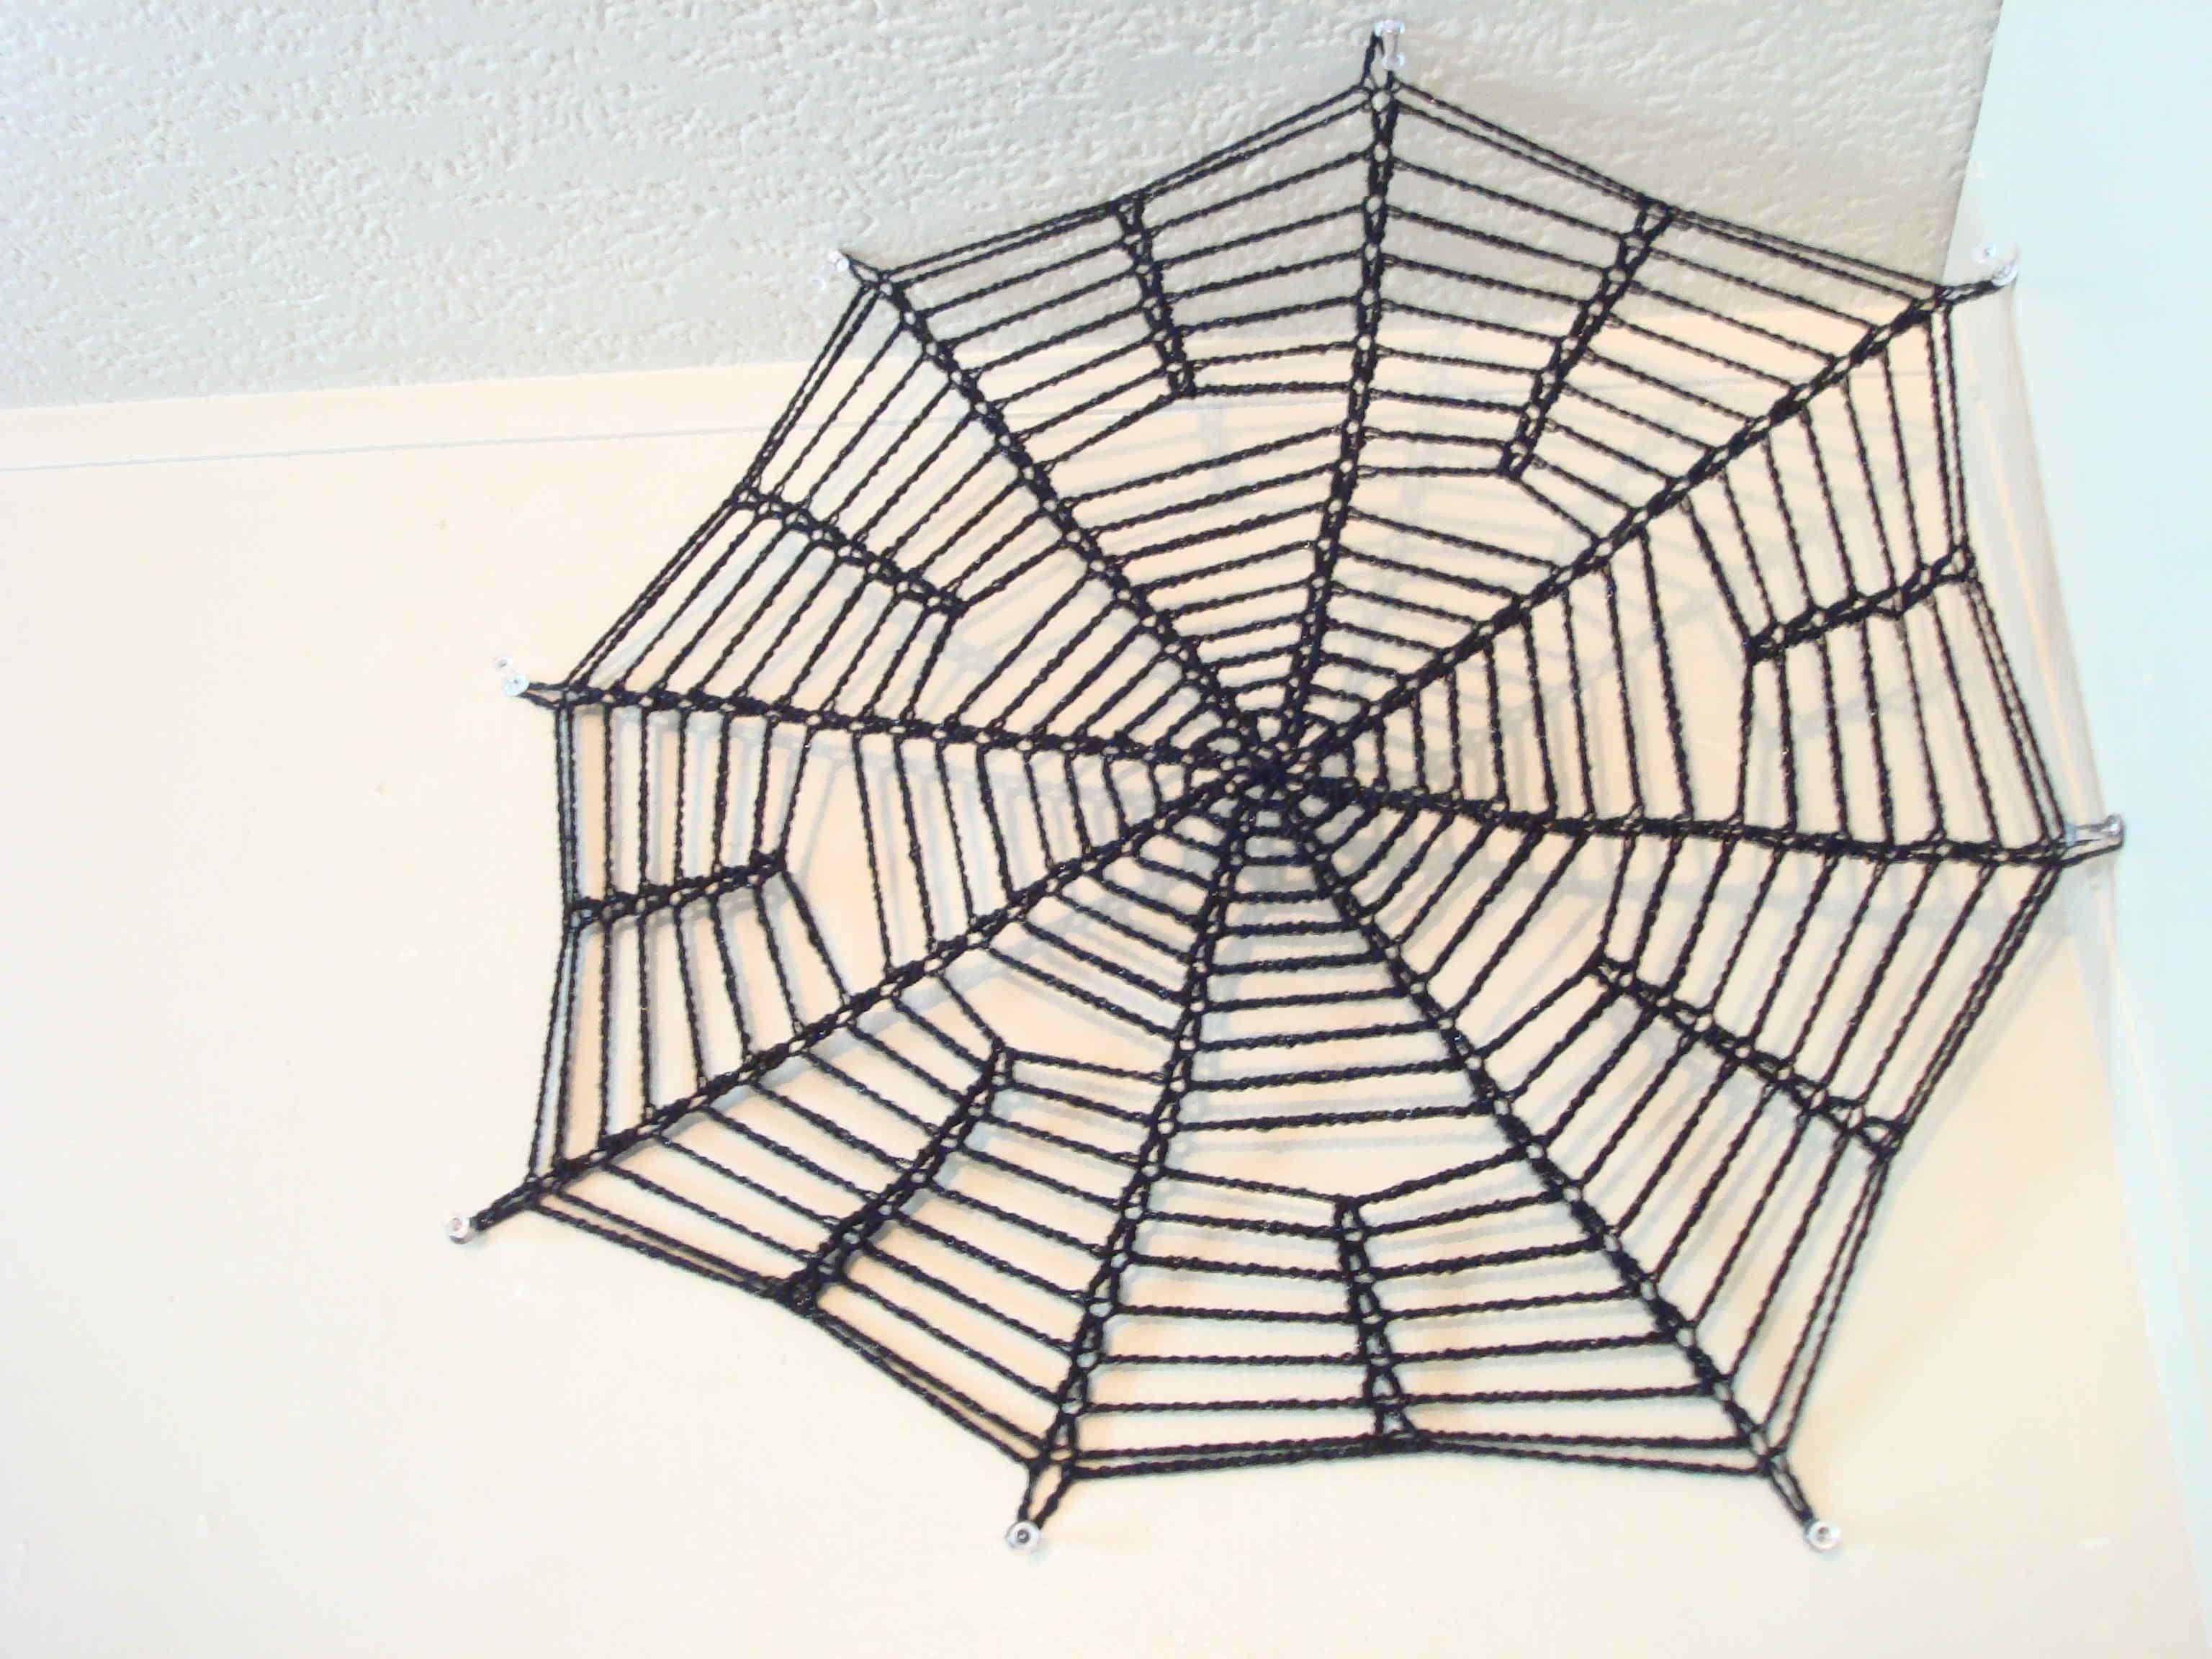 crocheted spider web | Crochet Spider Web & Spider for Halloween ...